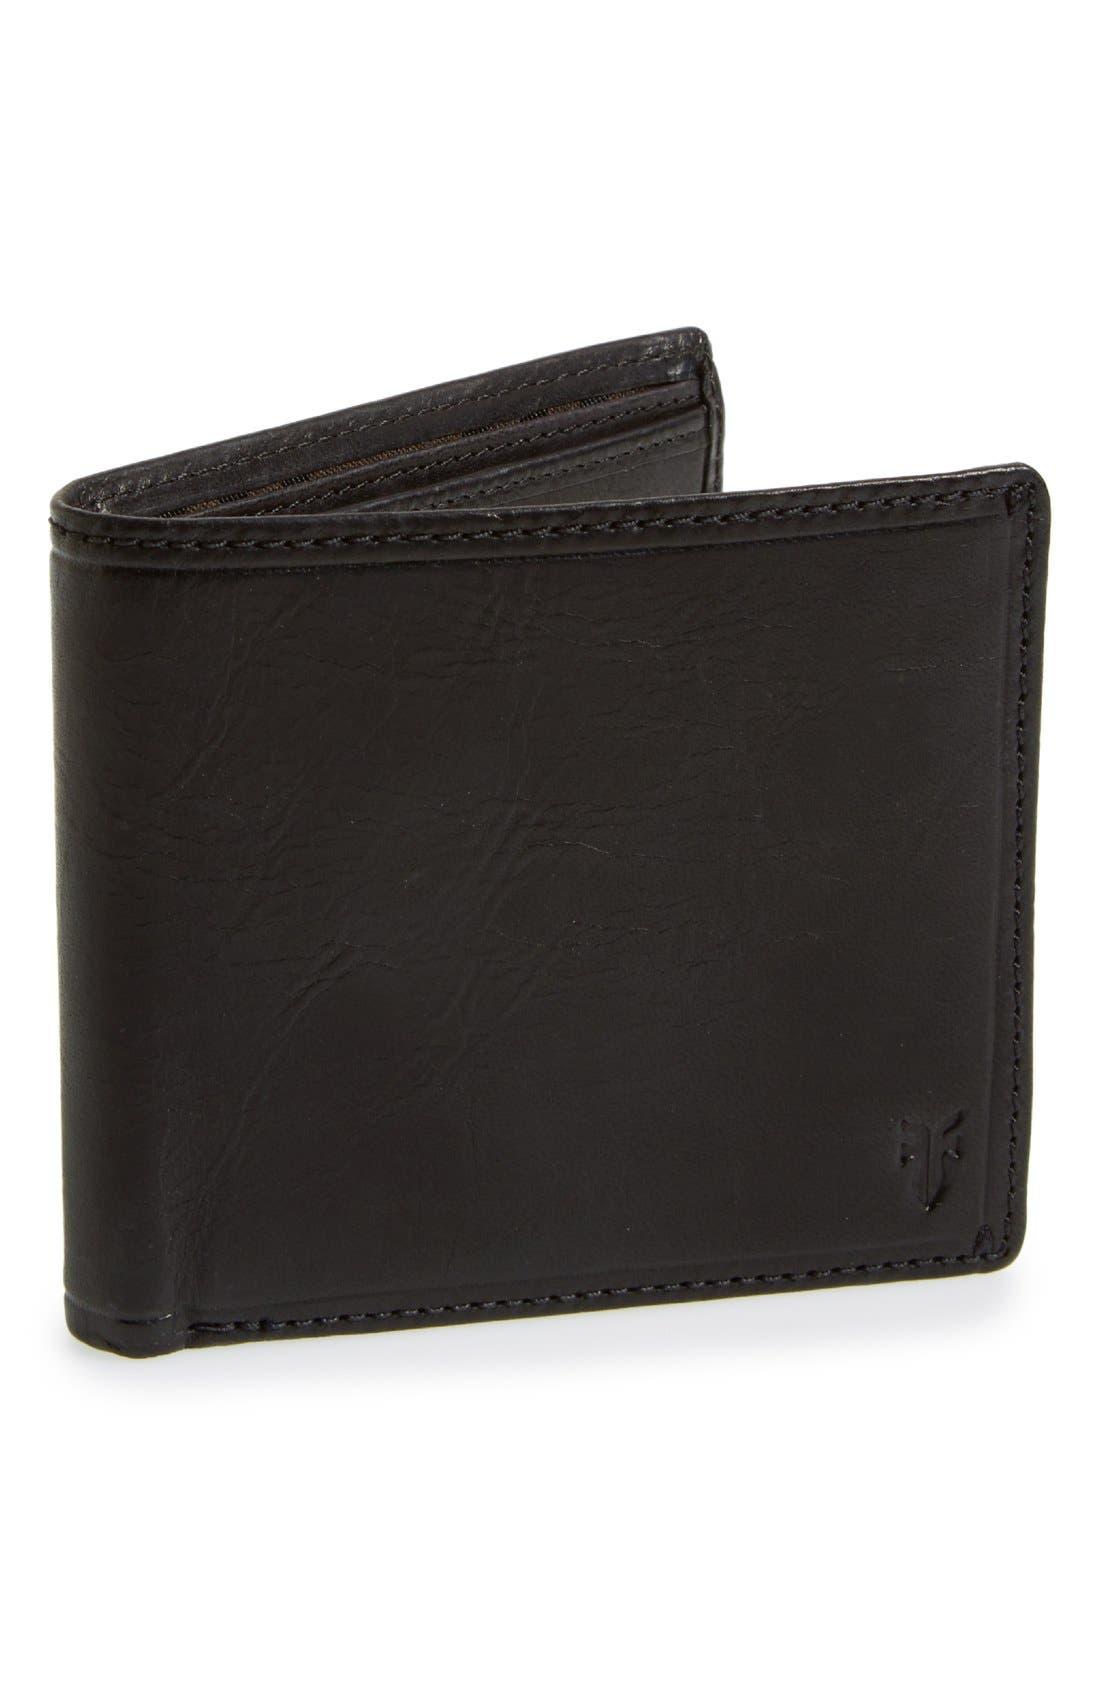 'Logan' Leather Billfold Wallet,                         Main,                         color,